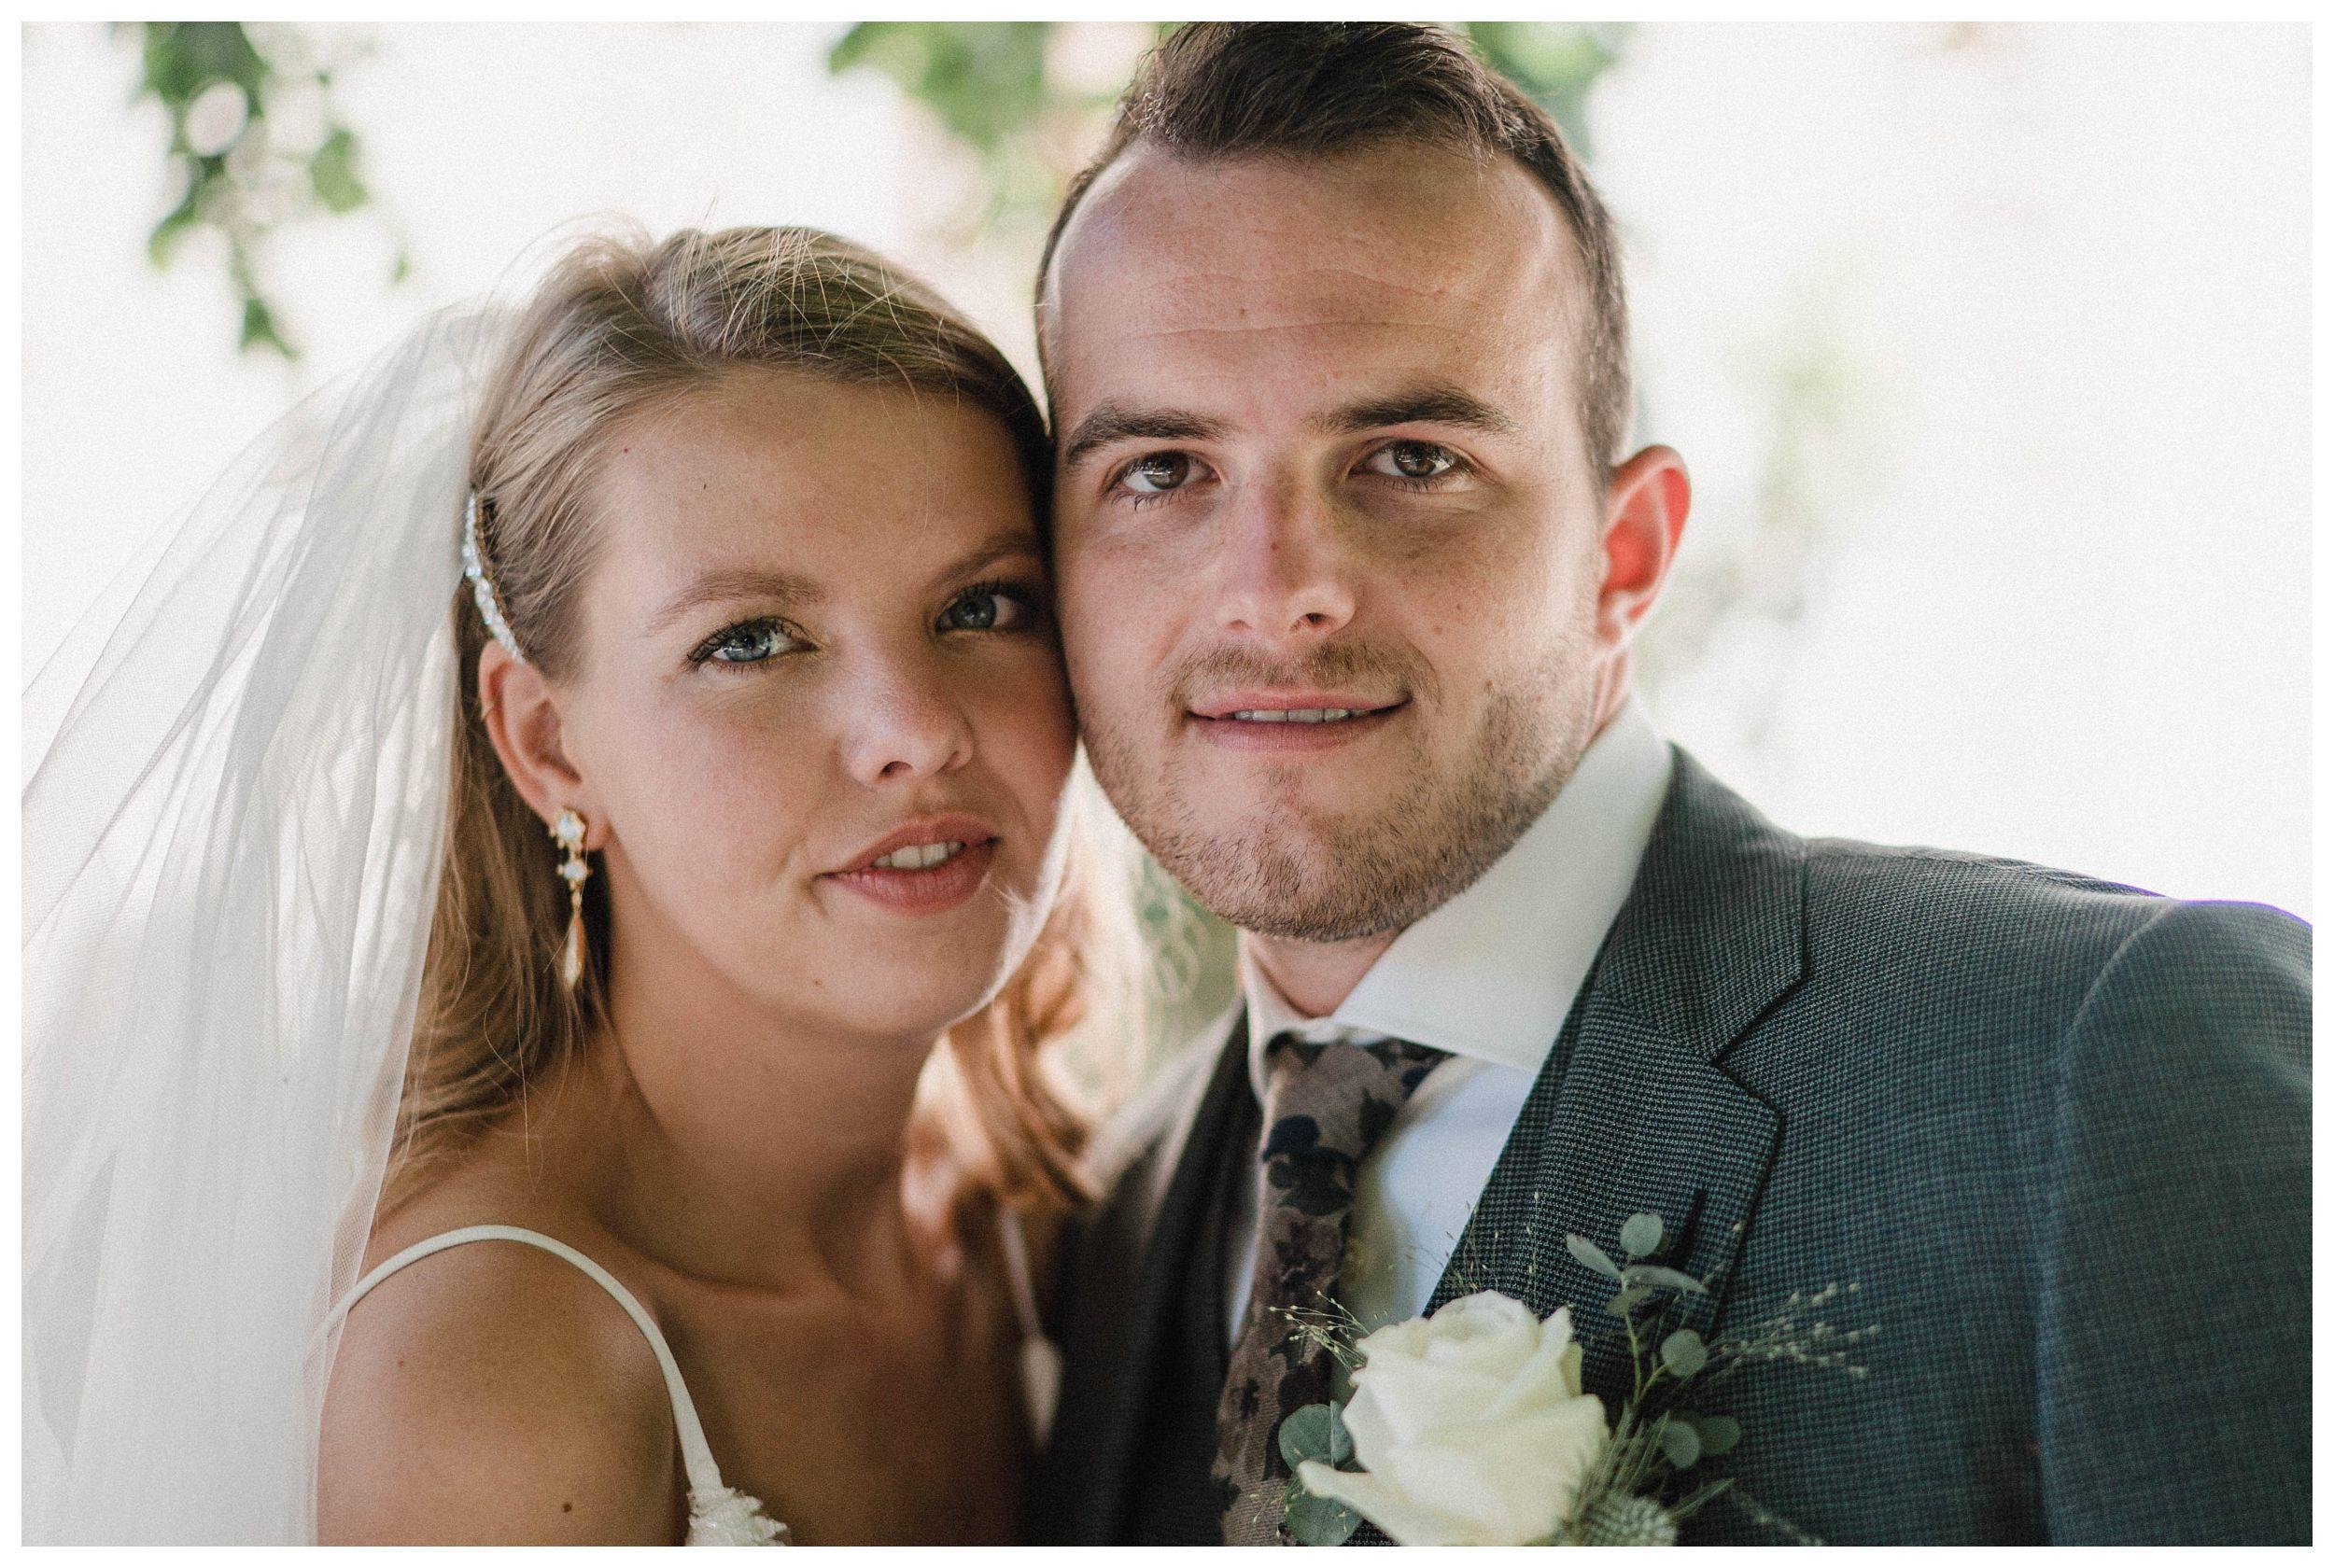 huwelijksfotograaf bruidsfotograaf destinationwedding huwelijksfotografie in ardennen nederland (57).jpg